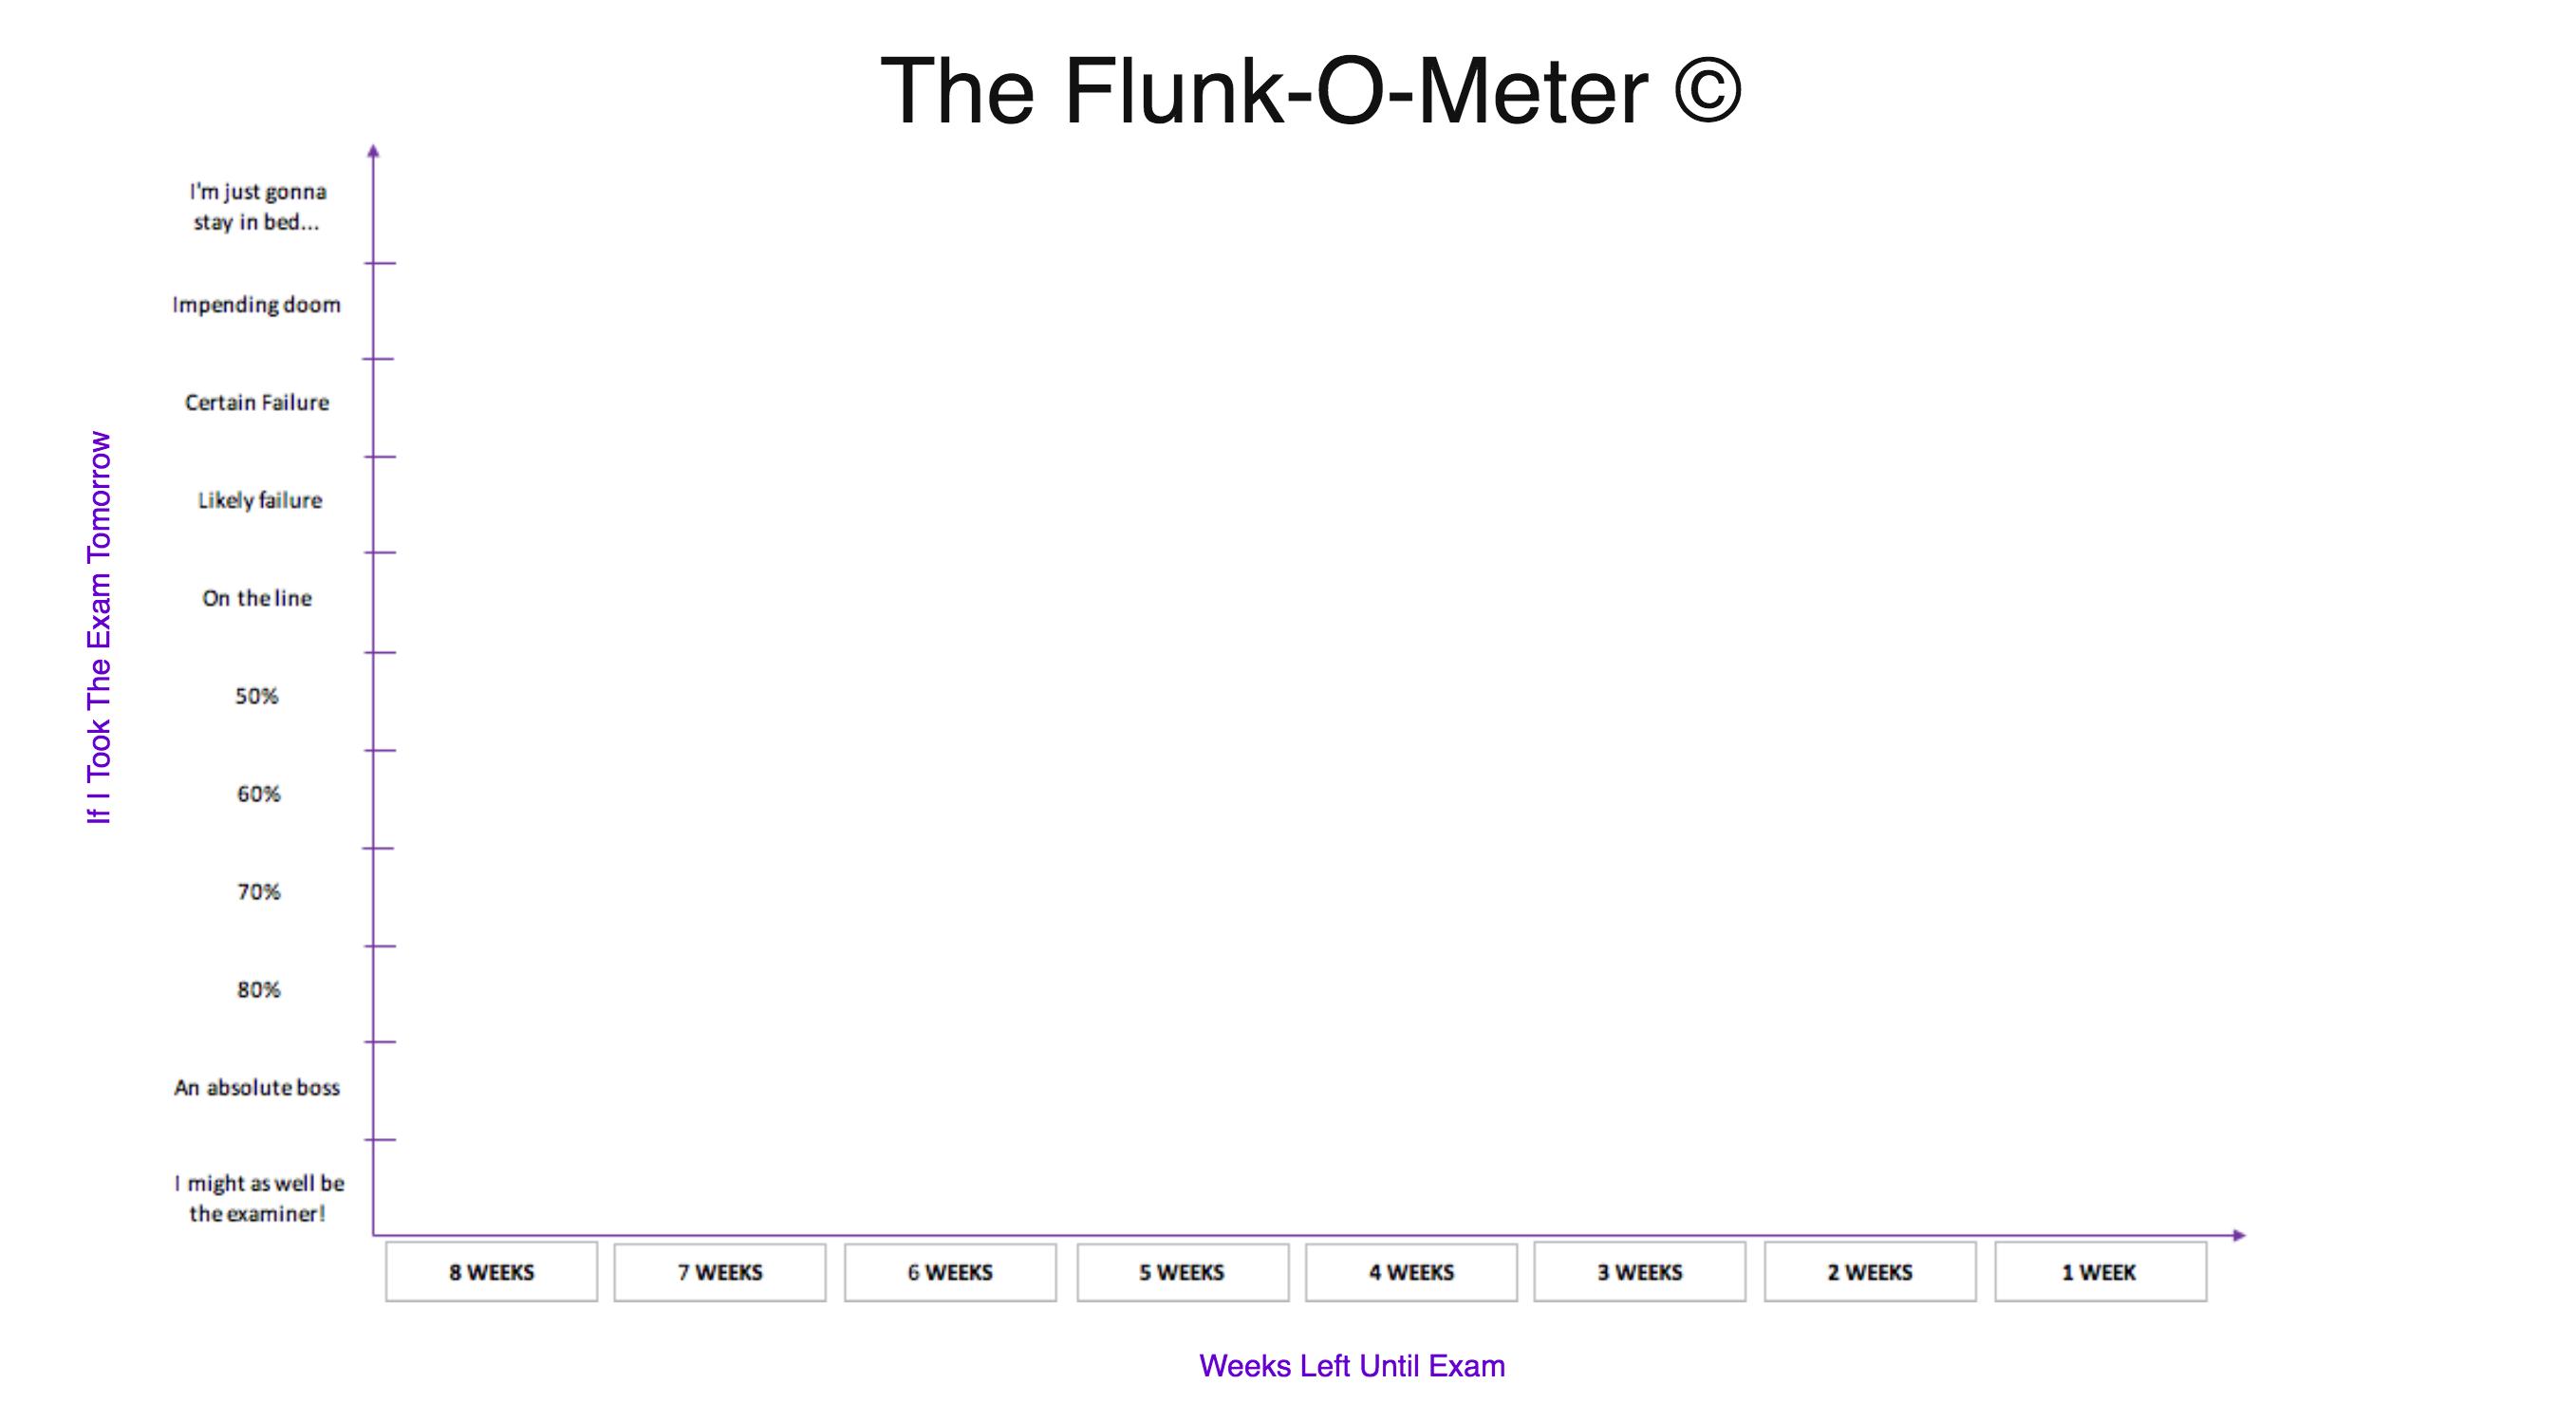 The Flunk-O-Meter